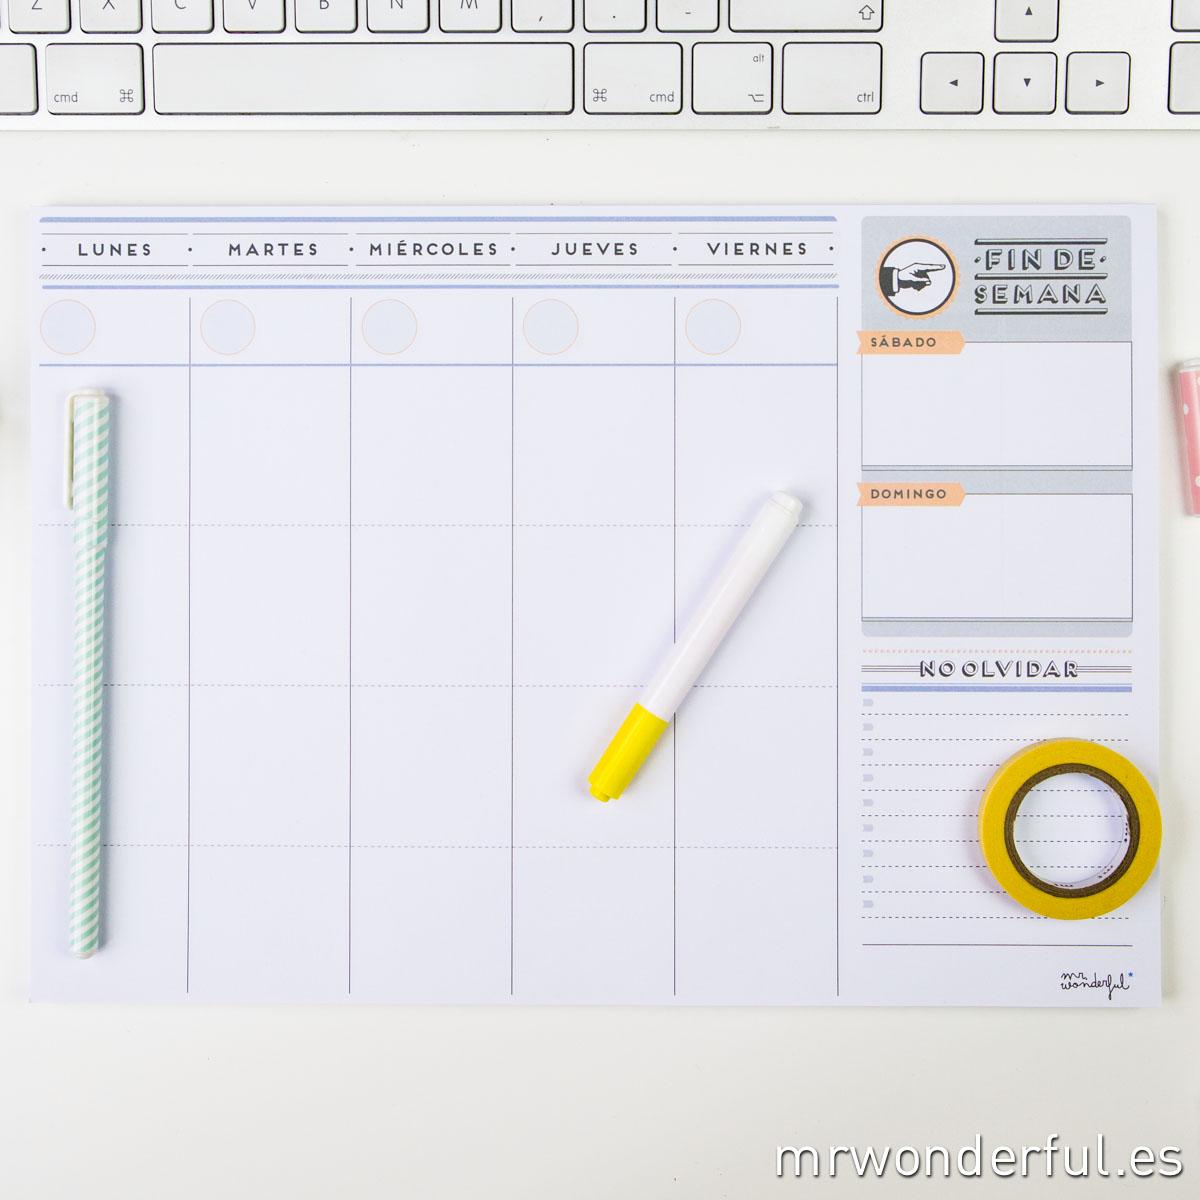 rwonderful_Organizador_oficina-30